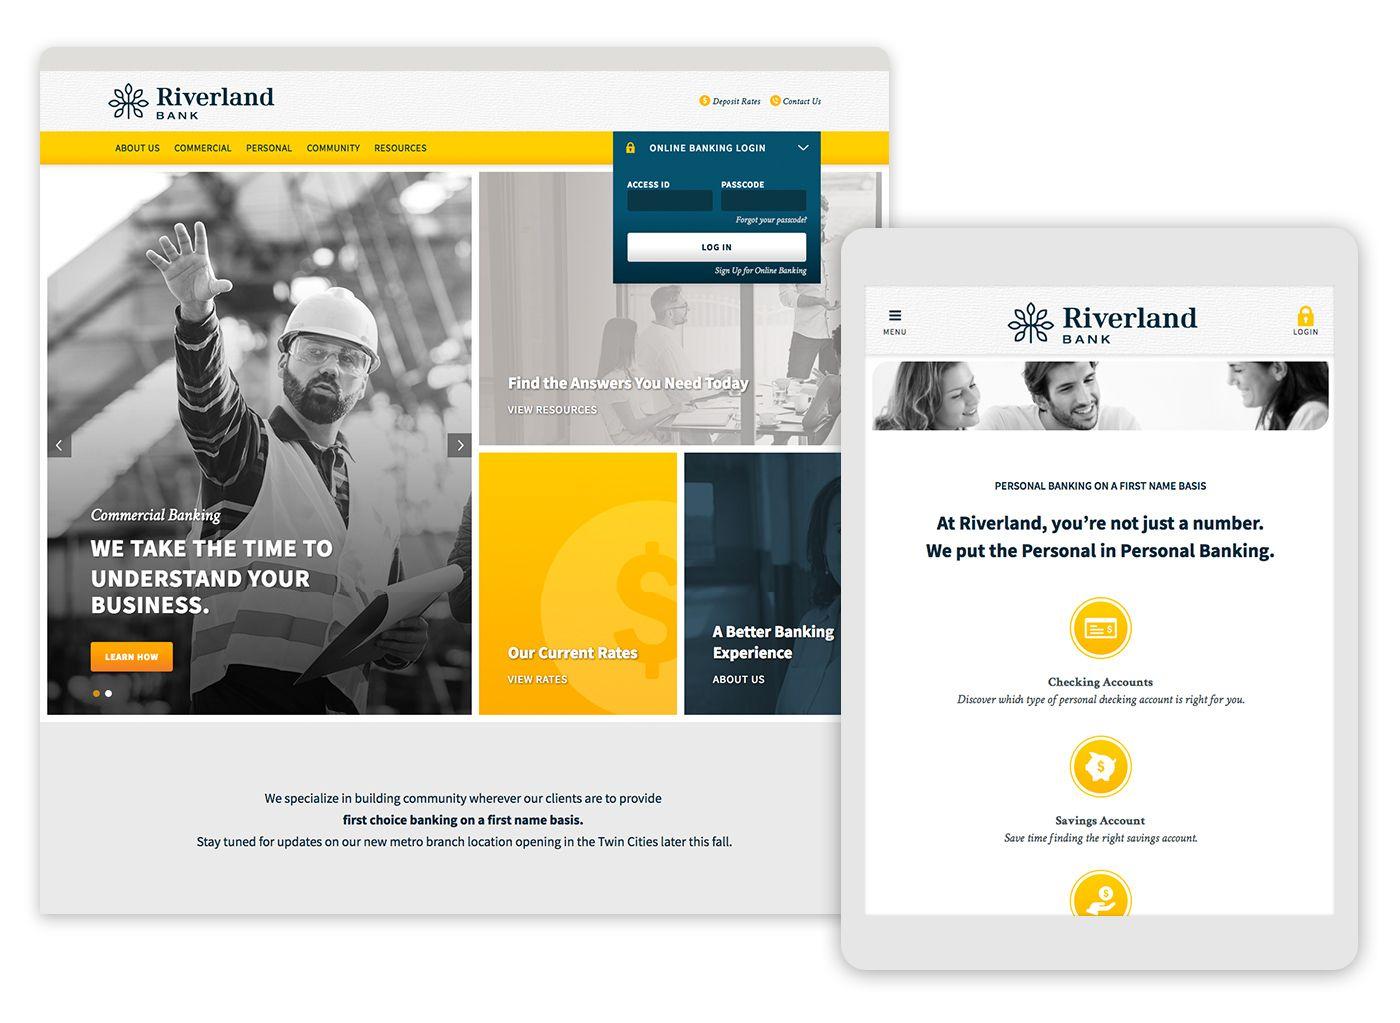 Riverland Bank 5ive Website Design Minneapolis Mn Banks Website Website Design Rebranding